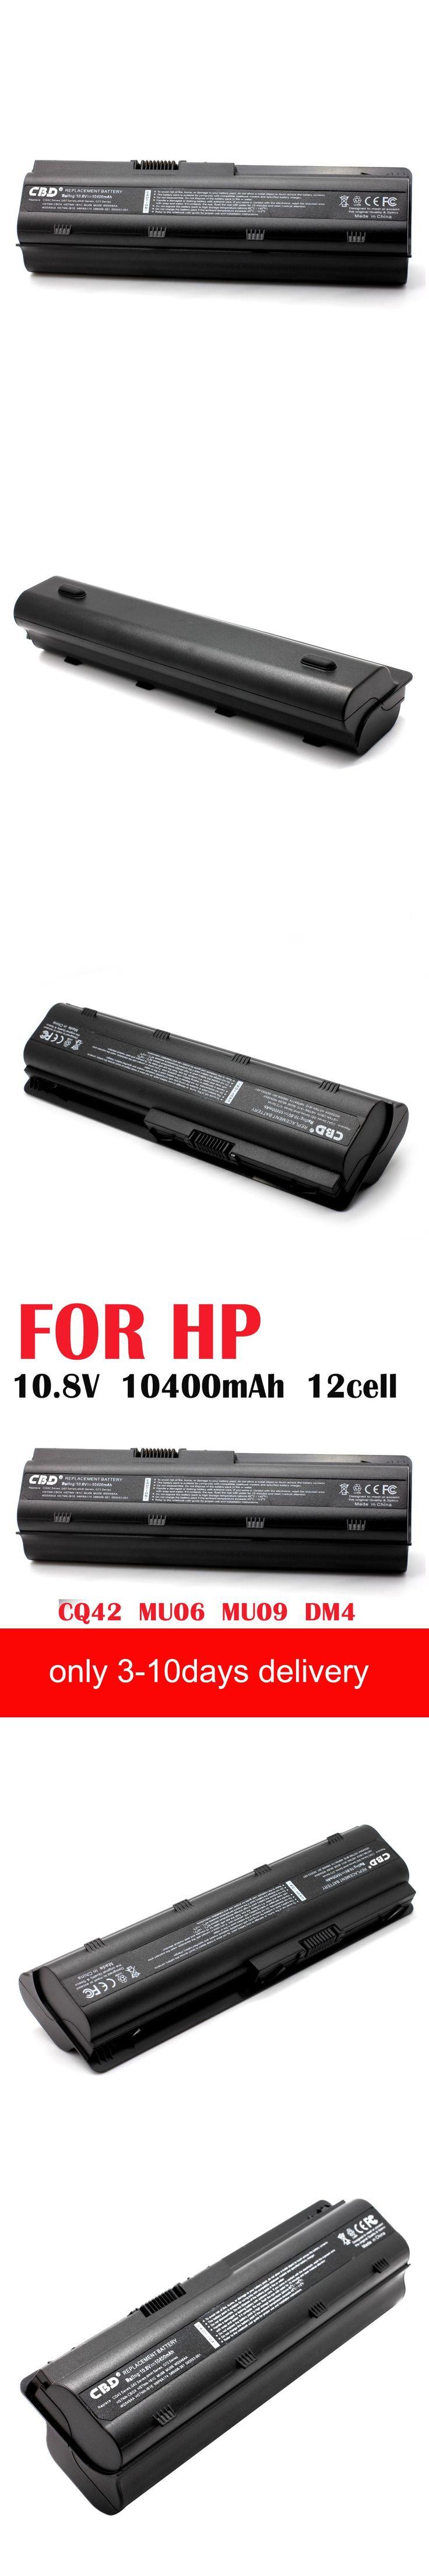 Replacement Brand New Laptop Battery for Hp Pavilion Dv6-6148nr Dv6-6149nr Dv6-6150us Dv6-6158nr Dv6-6163cl